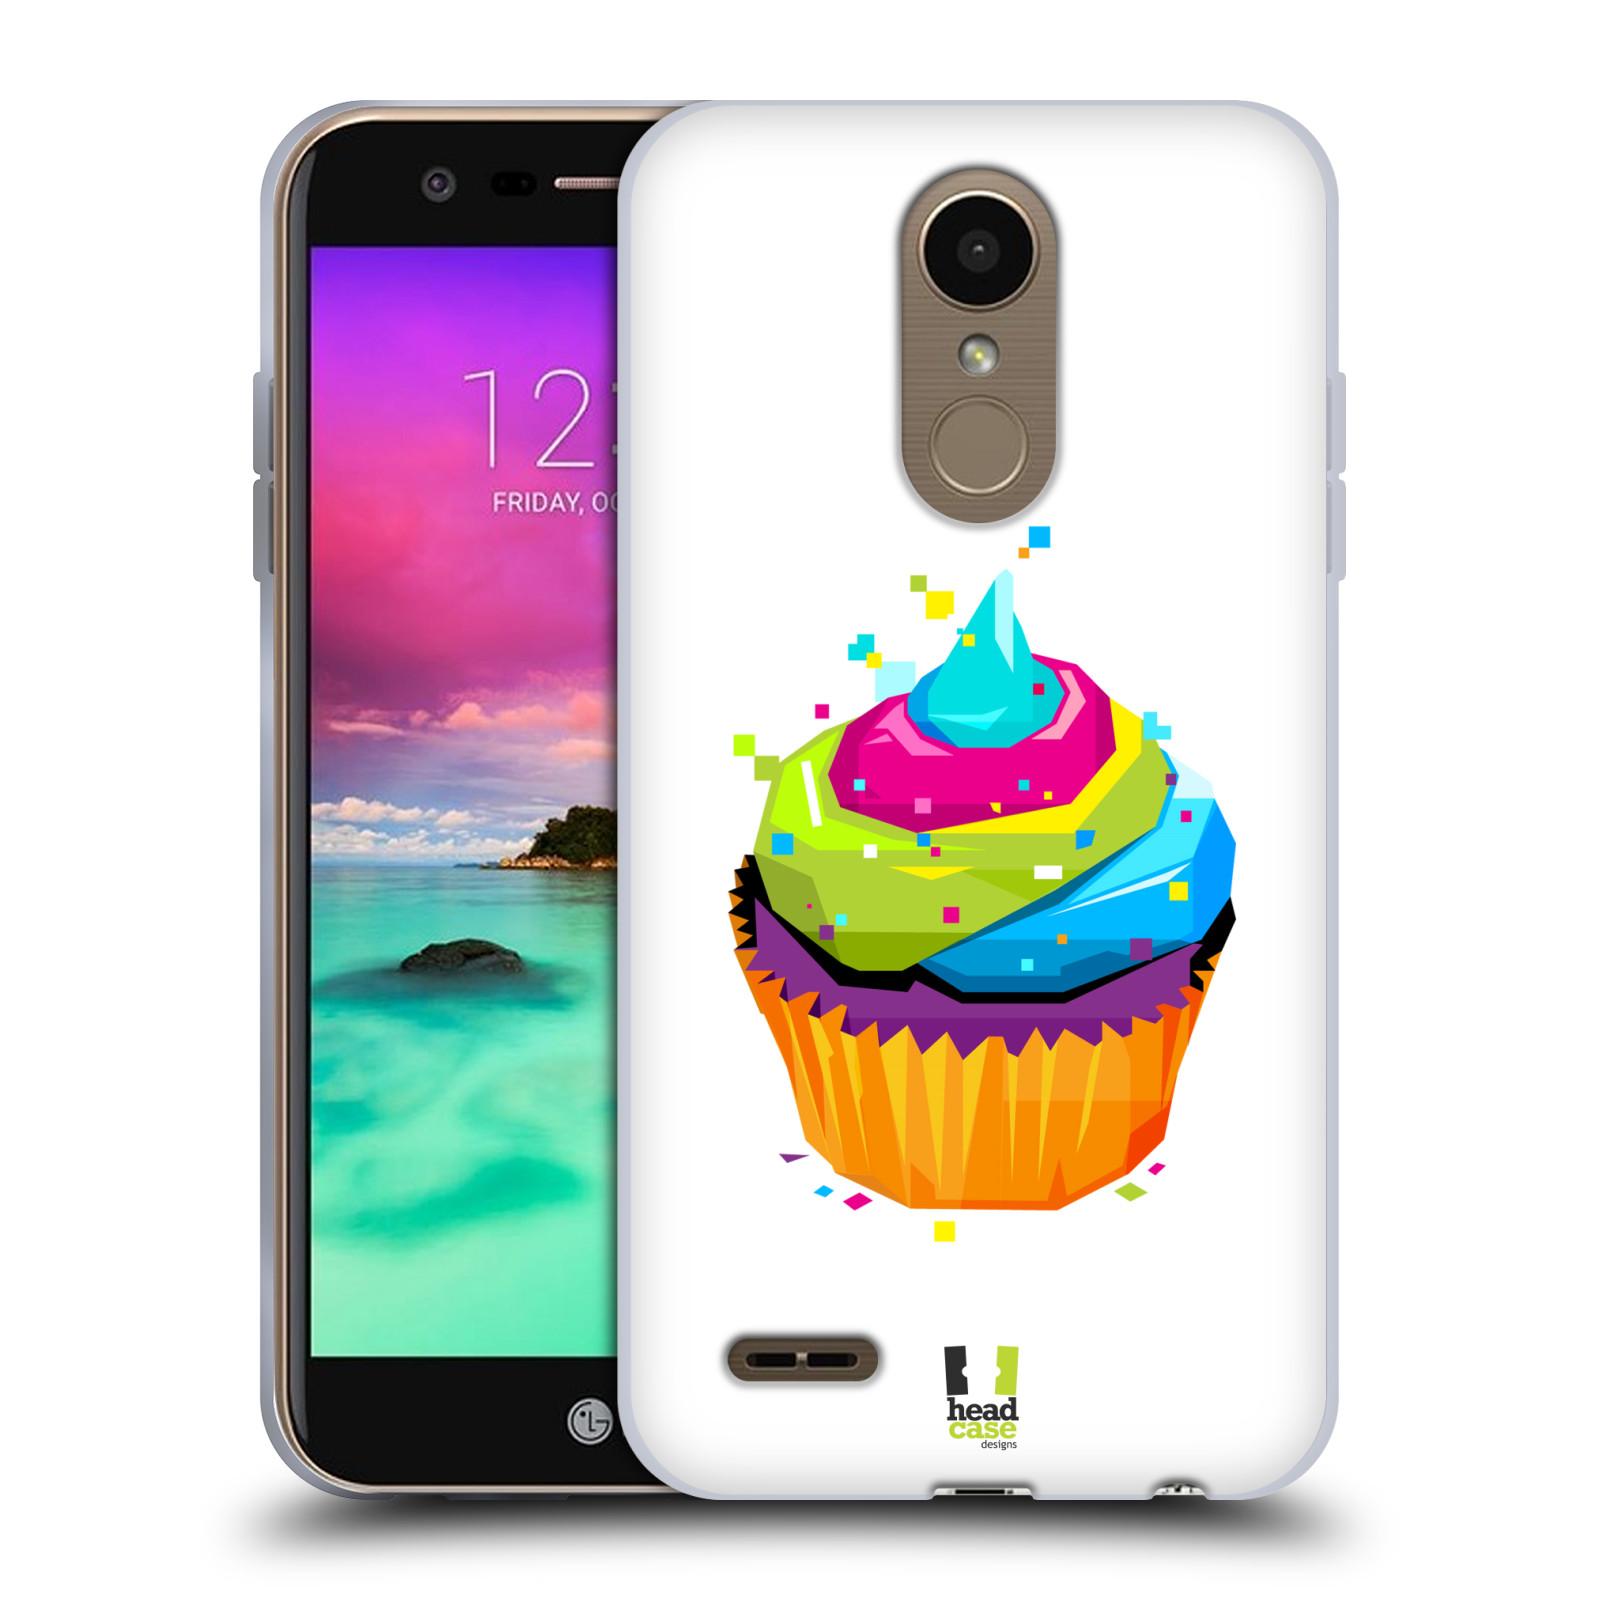 HEAD CASE silikonový obal na mobil LG K11 / K10 2018 vzor POP ART kubismus dortík